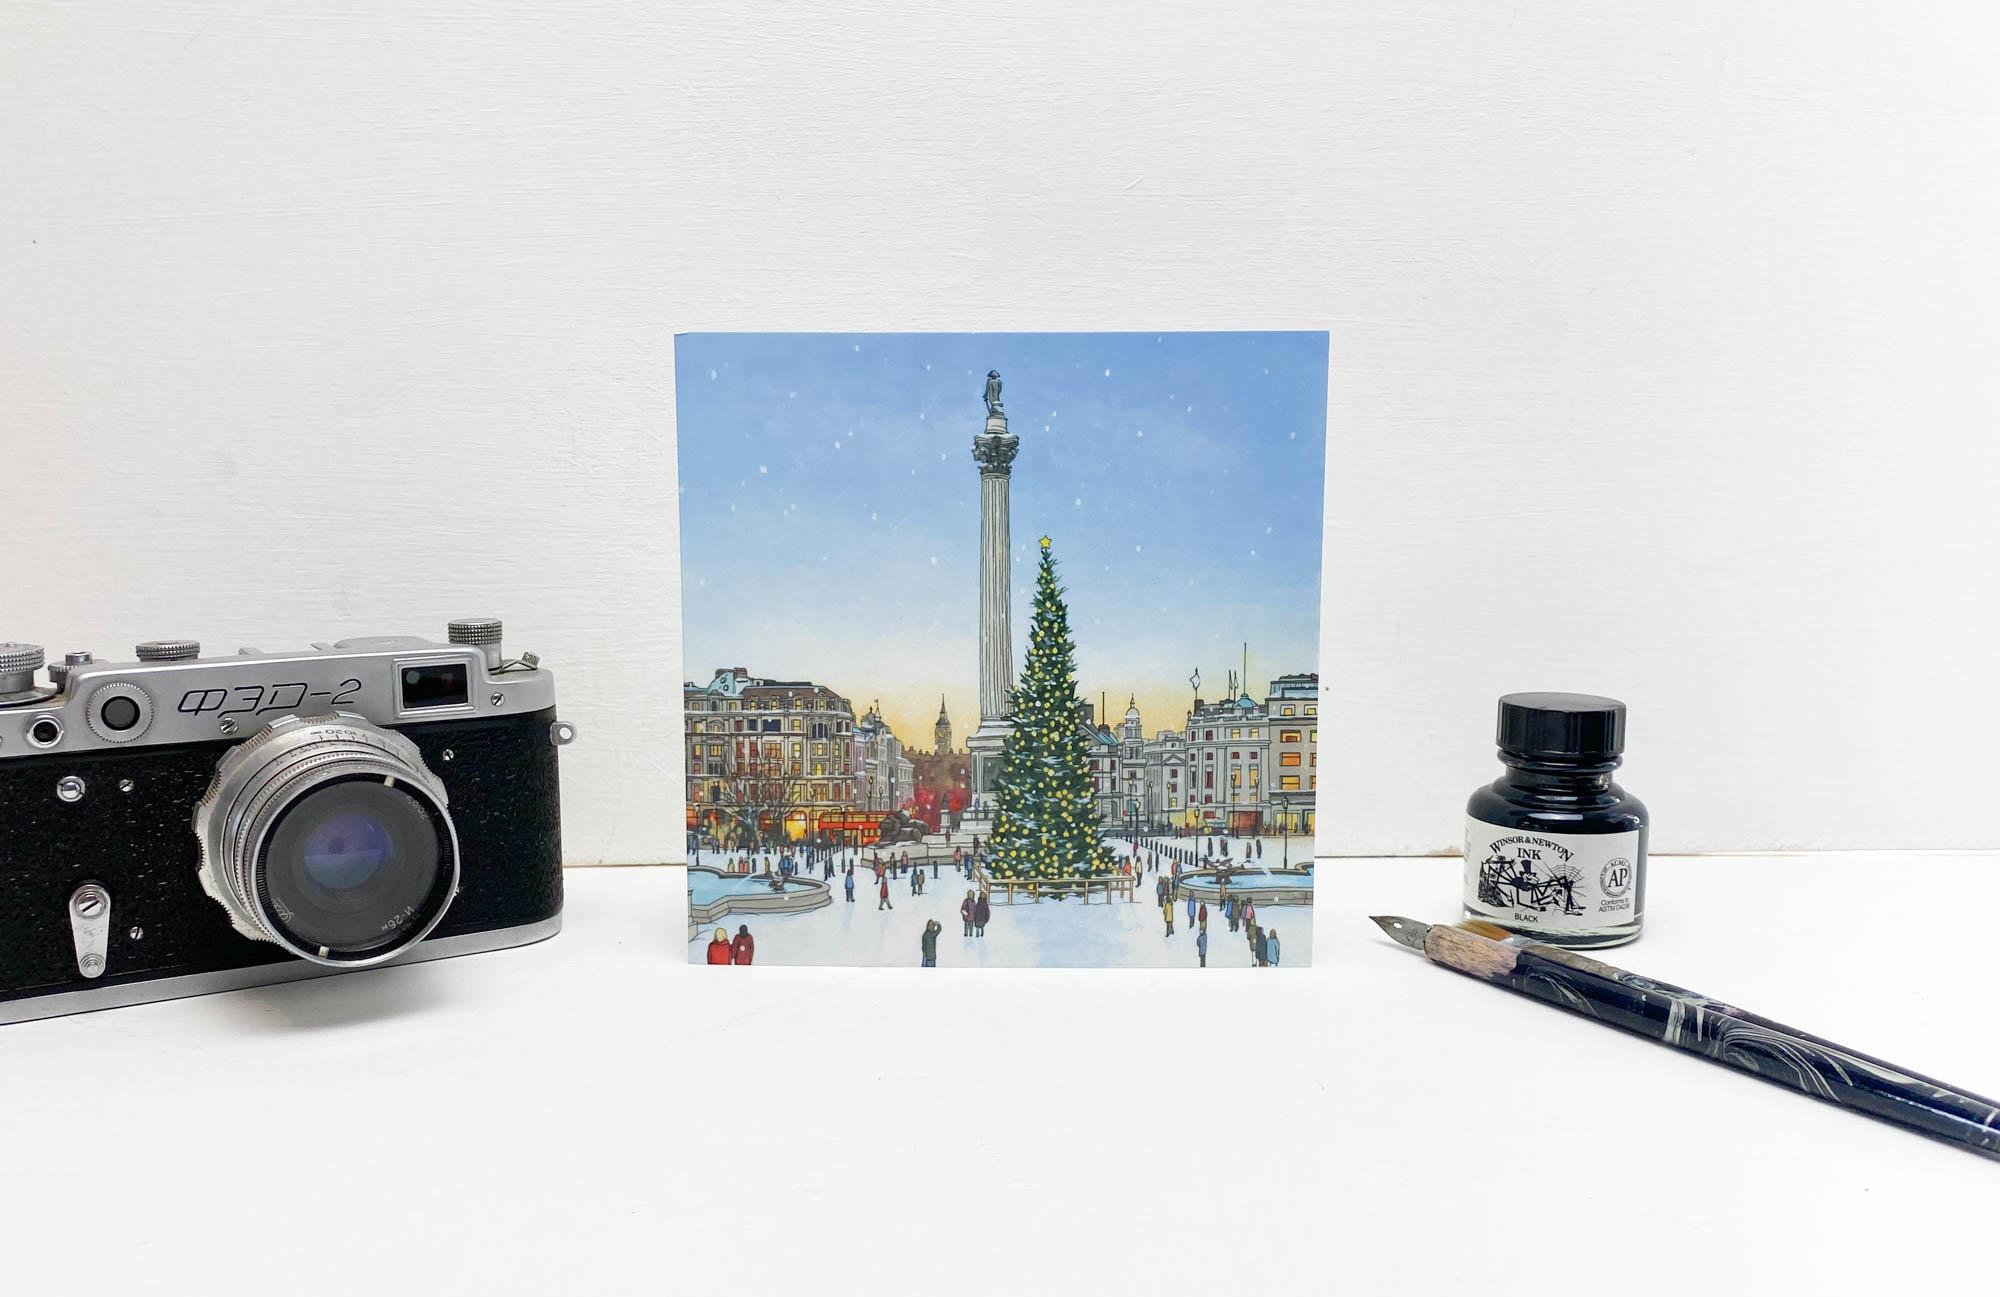 Trafalgar Square Christmas Tree Greeting Card - Illustration by Jonathan Chapman